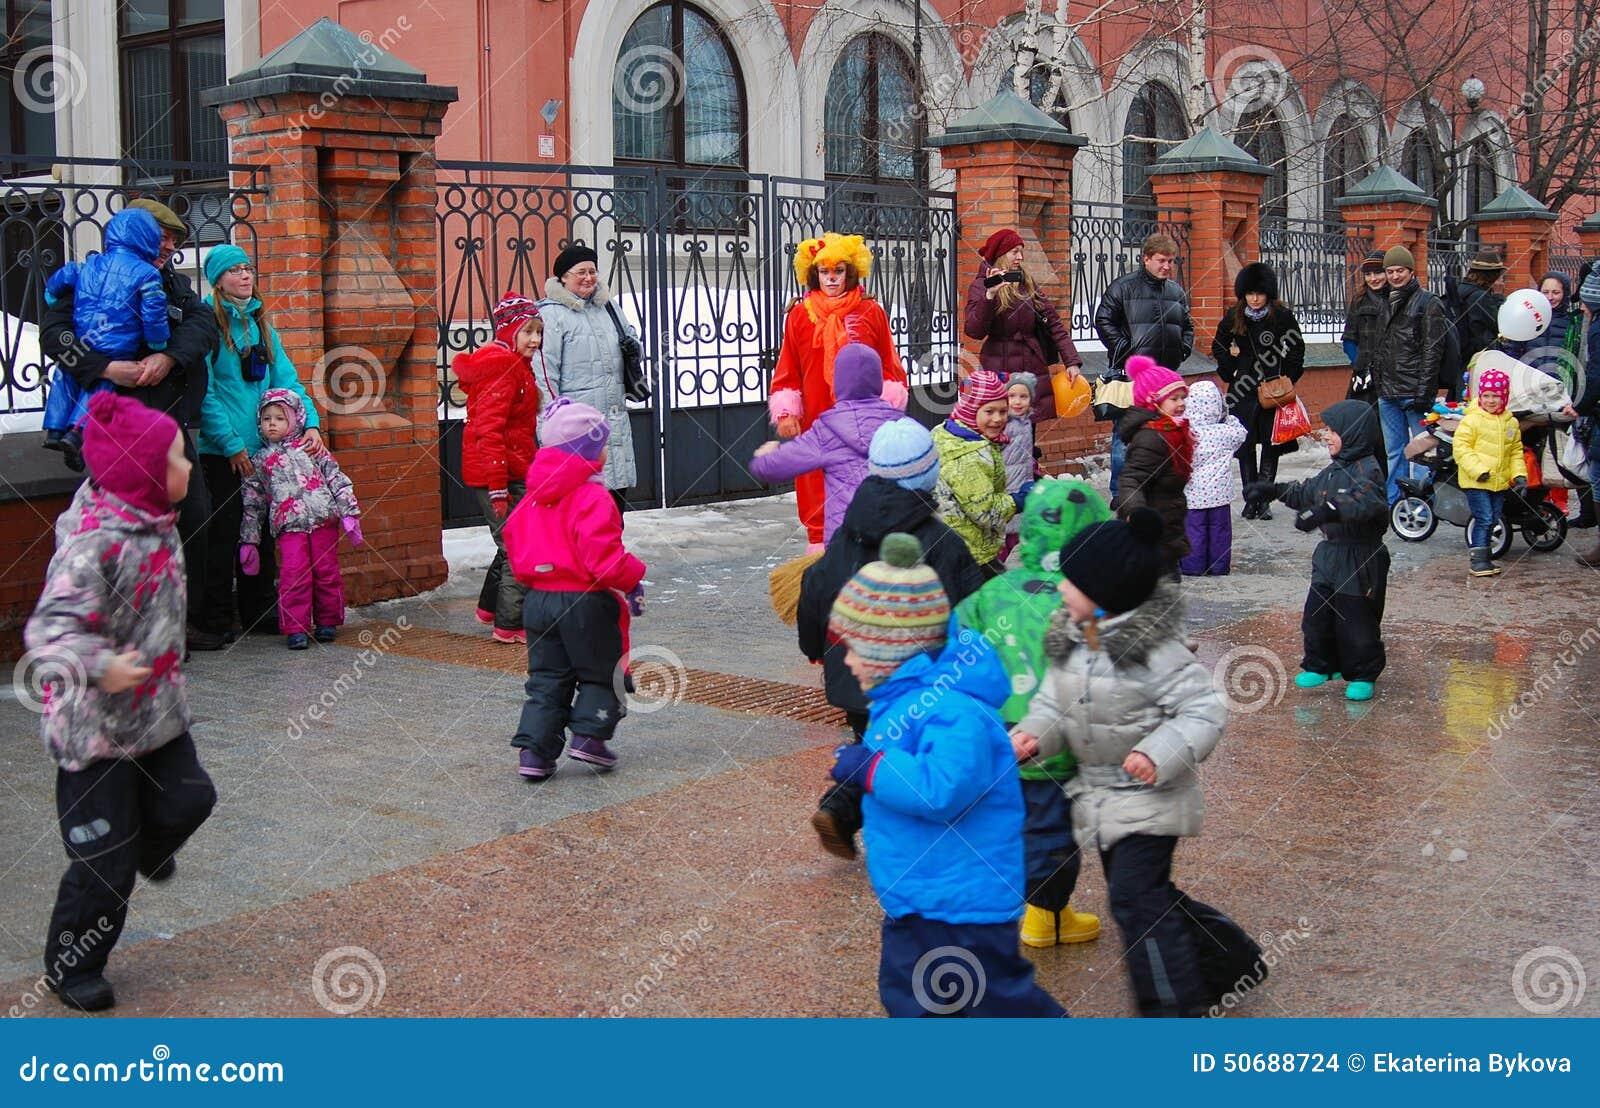 Download 在街道上的人舞蹈 Shrovetide庆祝在莫斯科 编辑类库存图片. 图片 包括有 跳舞, 伙计, 敌意 - 50688724